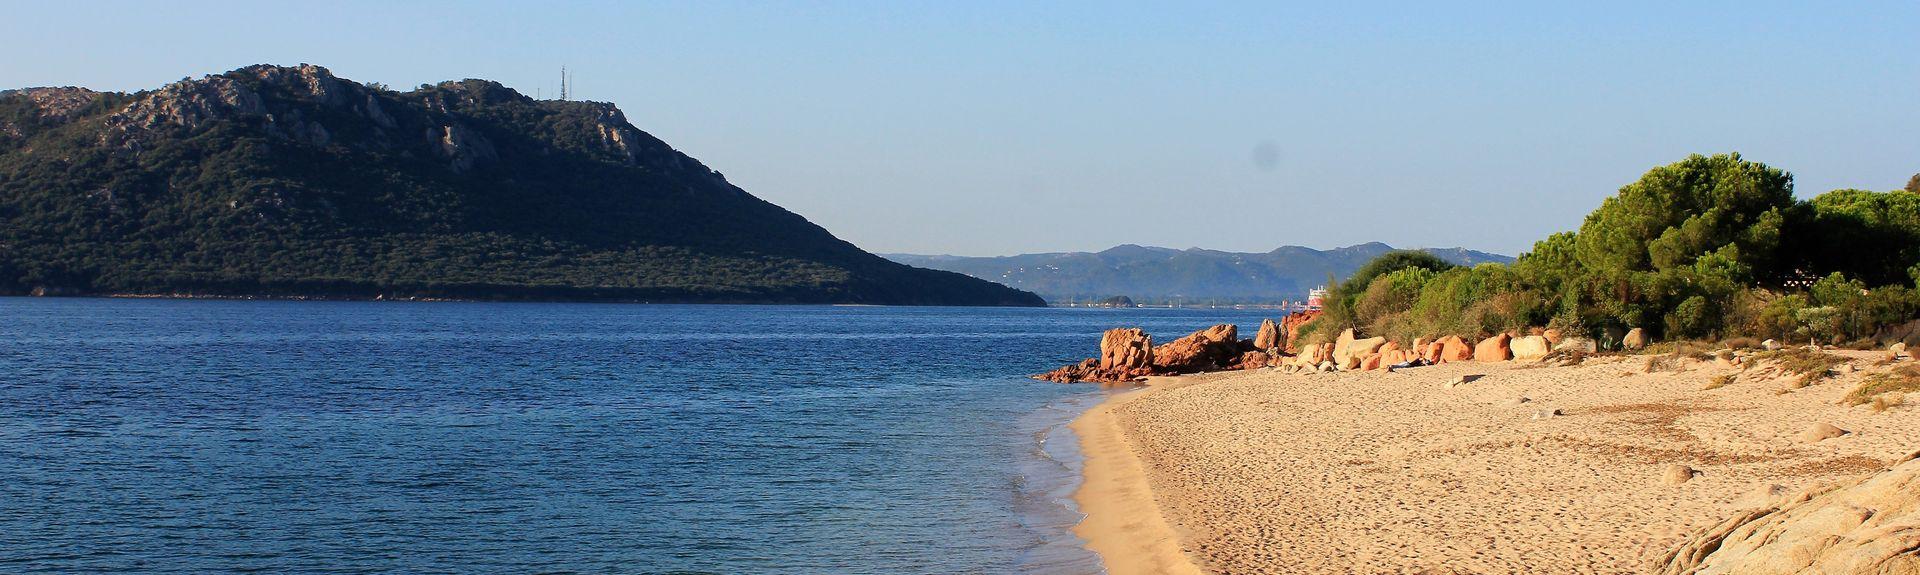 Tarco Beach, Conca, Corse-du-Sud, France